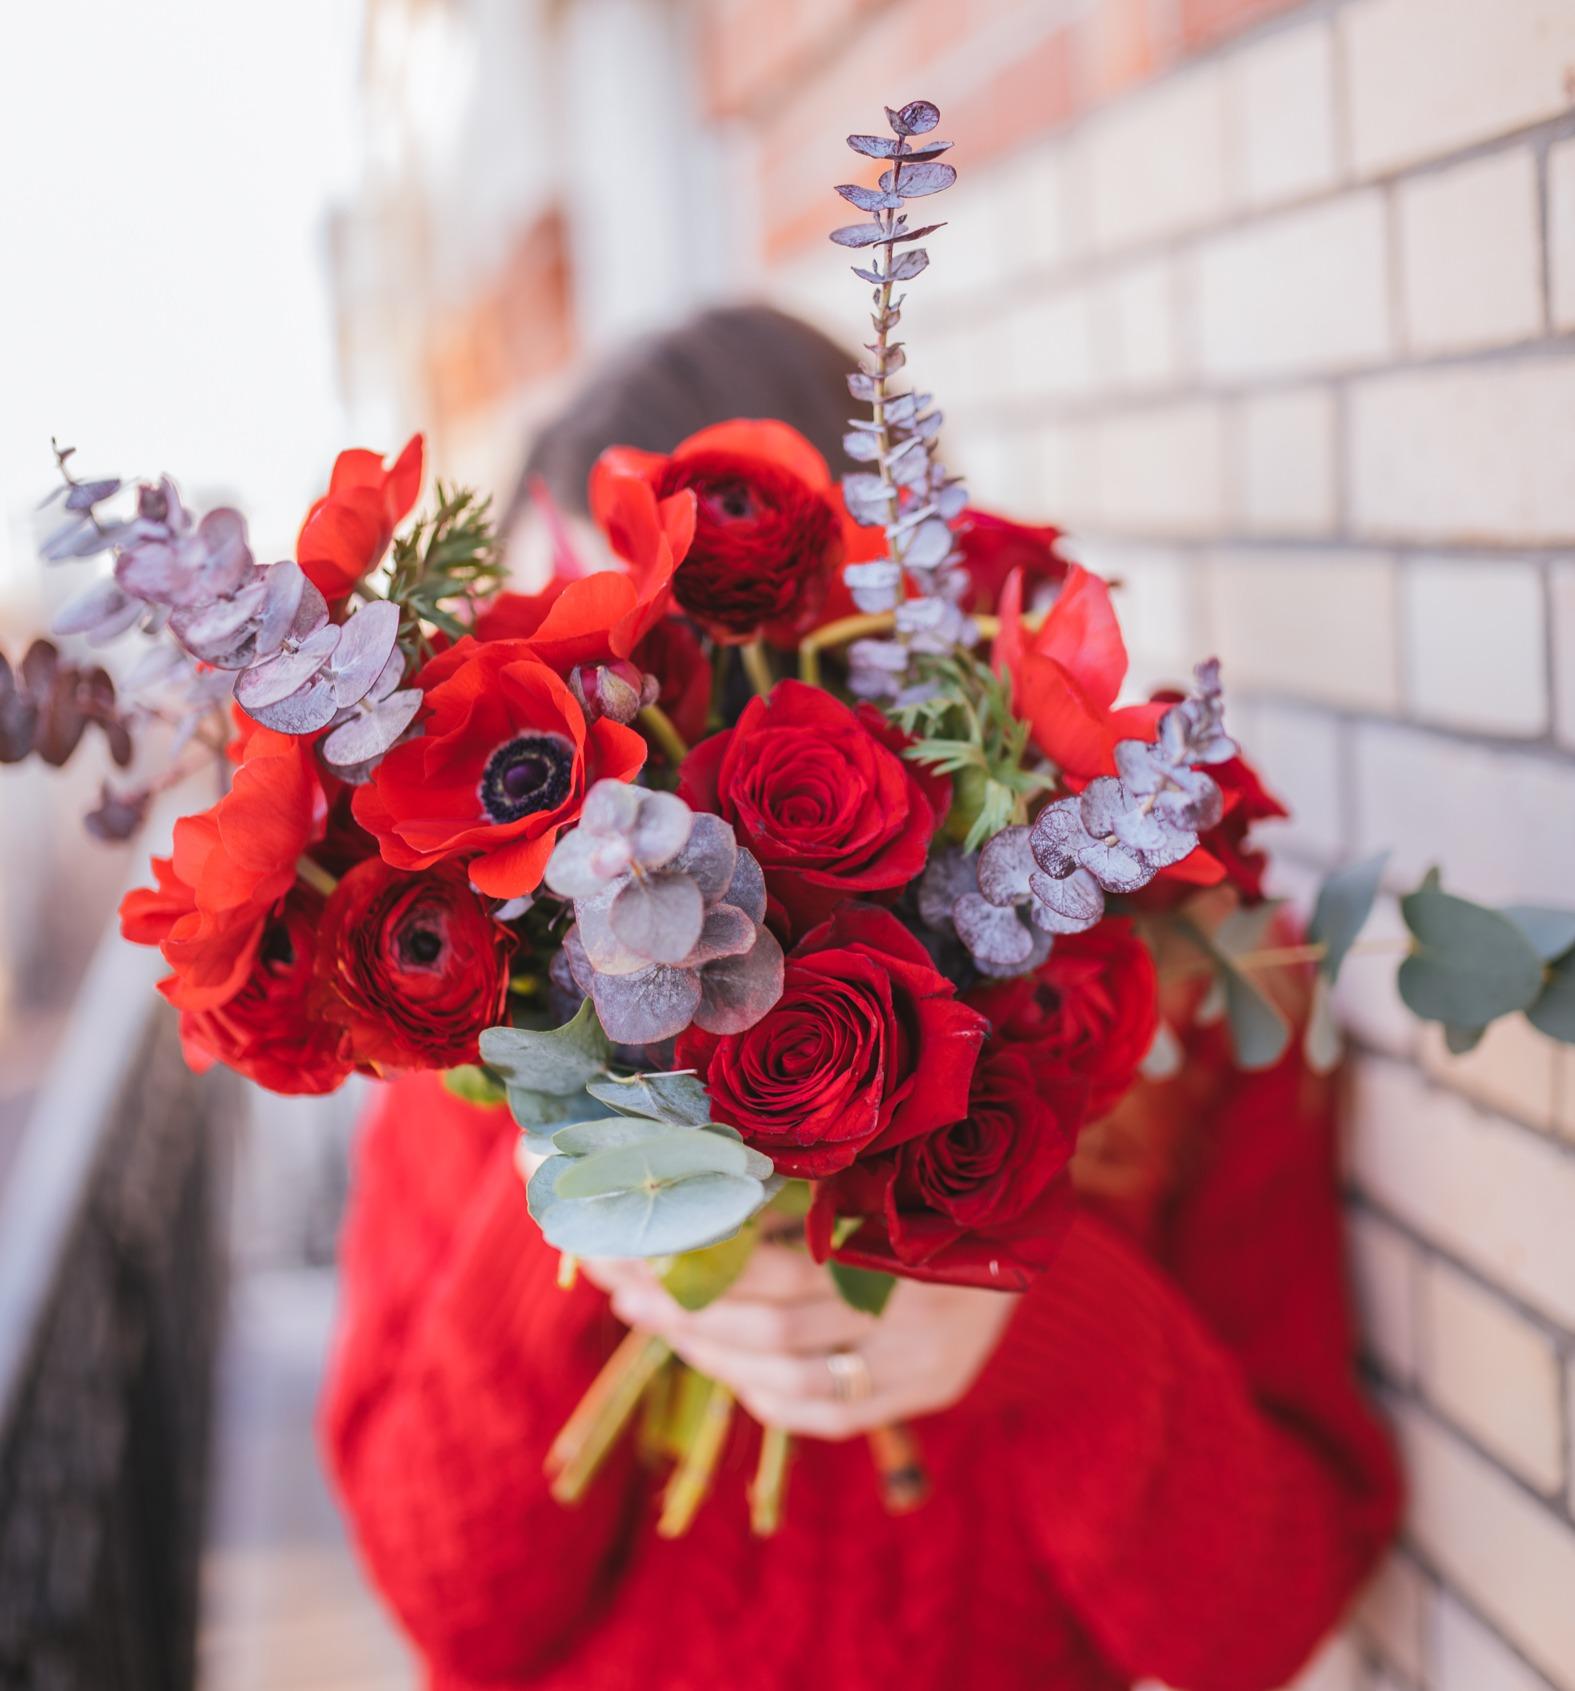 bouquet à livrer tendresse